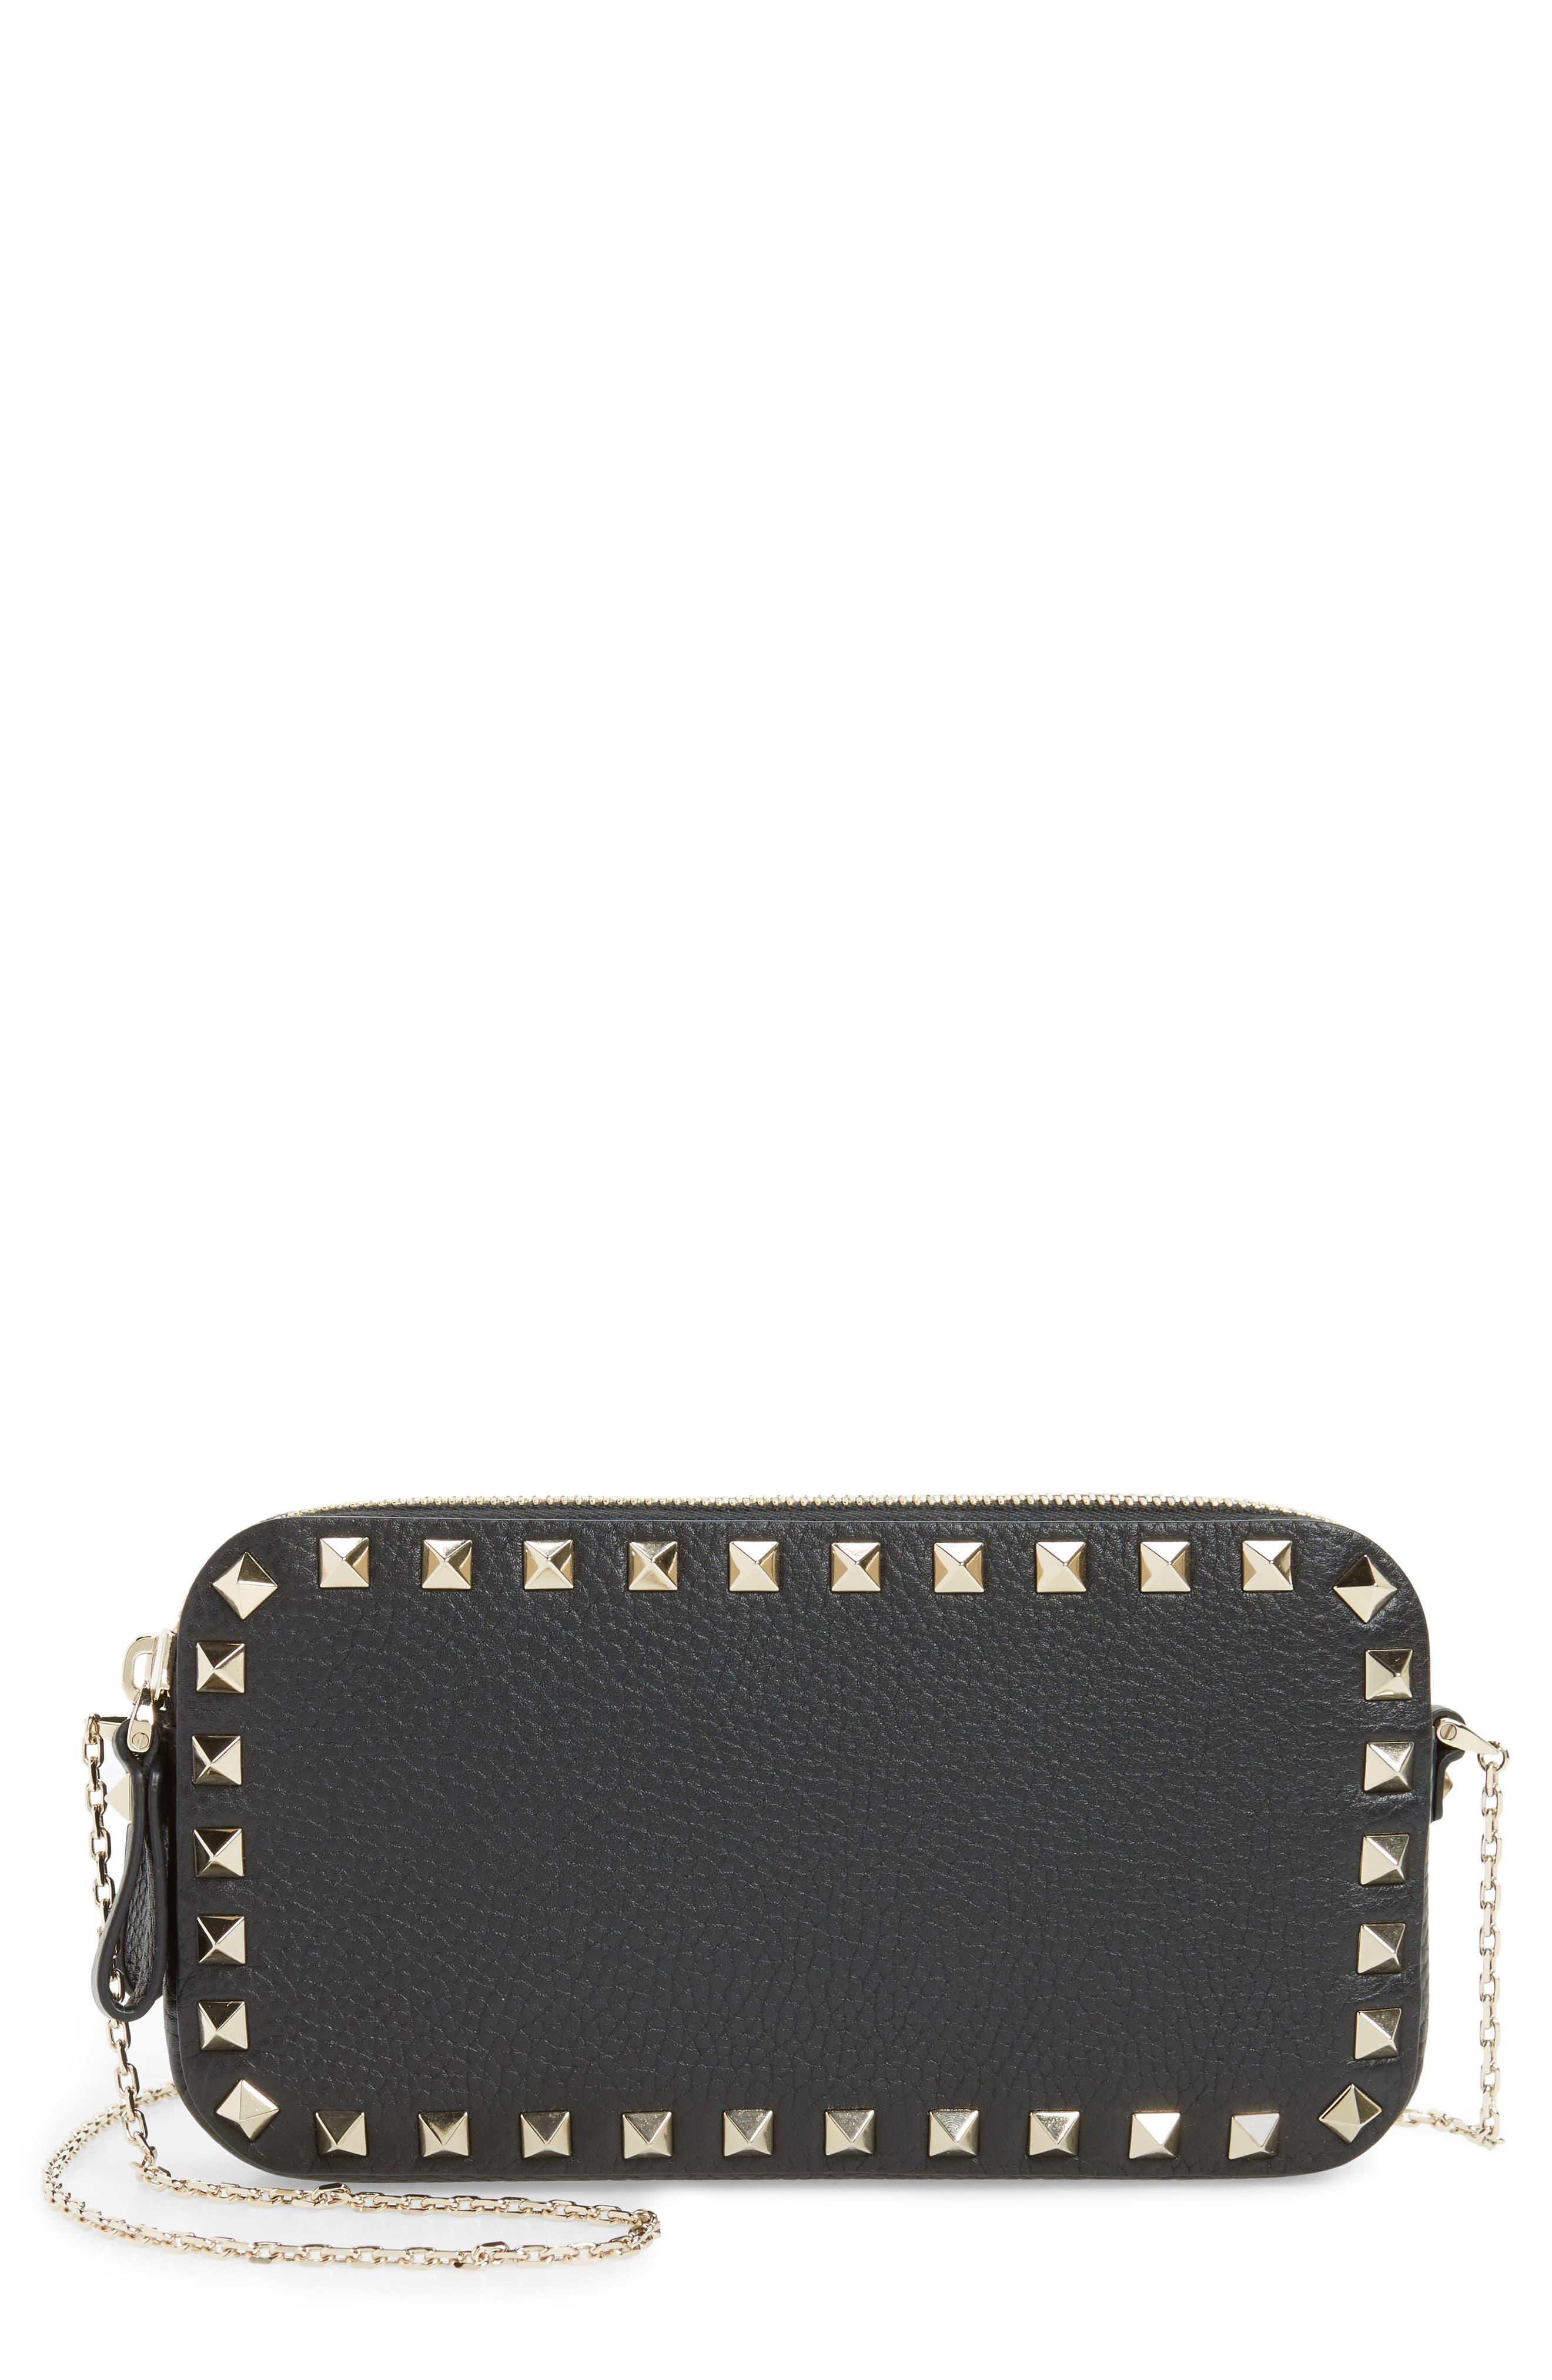 Mini Calfskin Leather Camera Bag,                             Main thumbnail 1, color,                             001